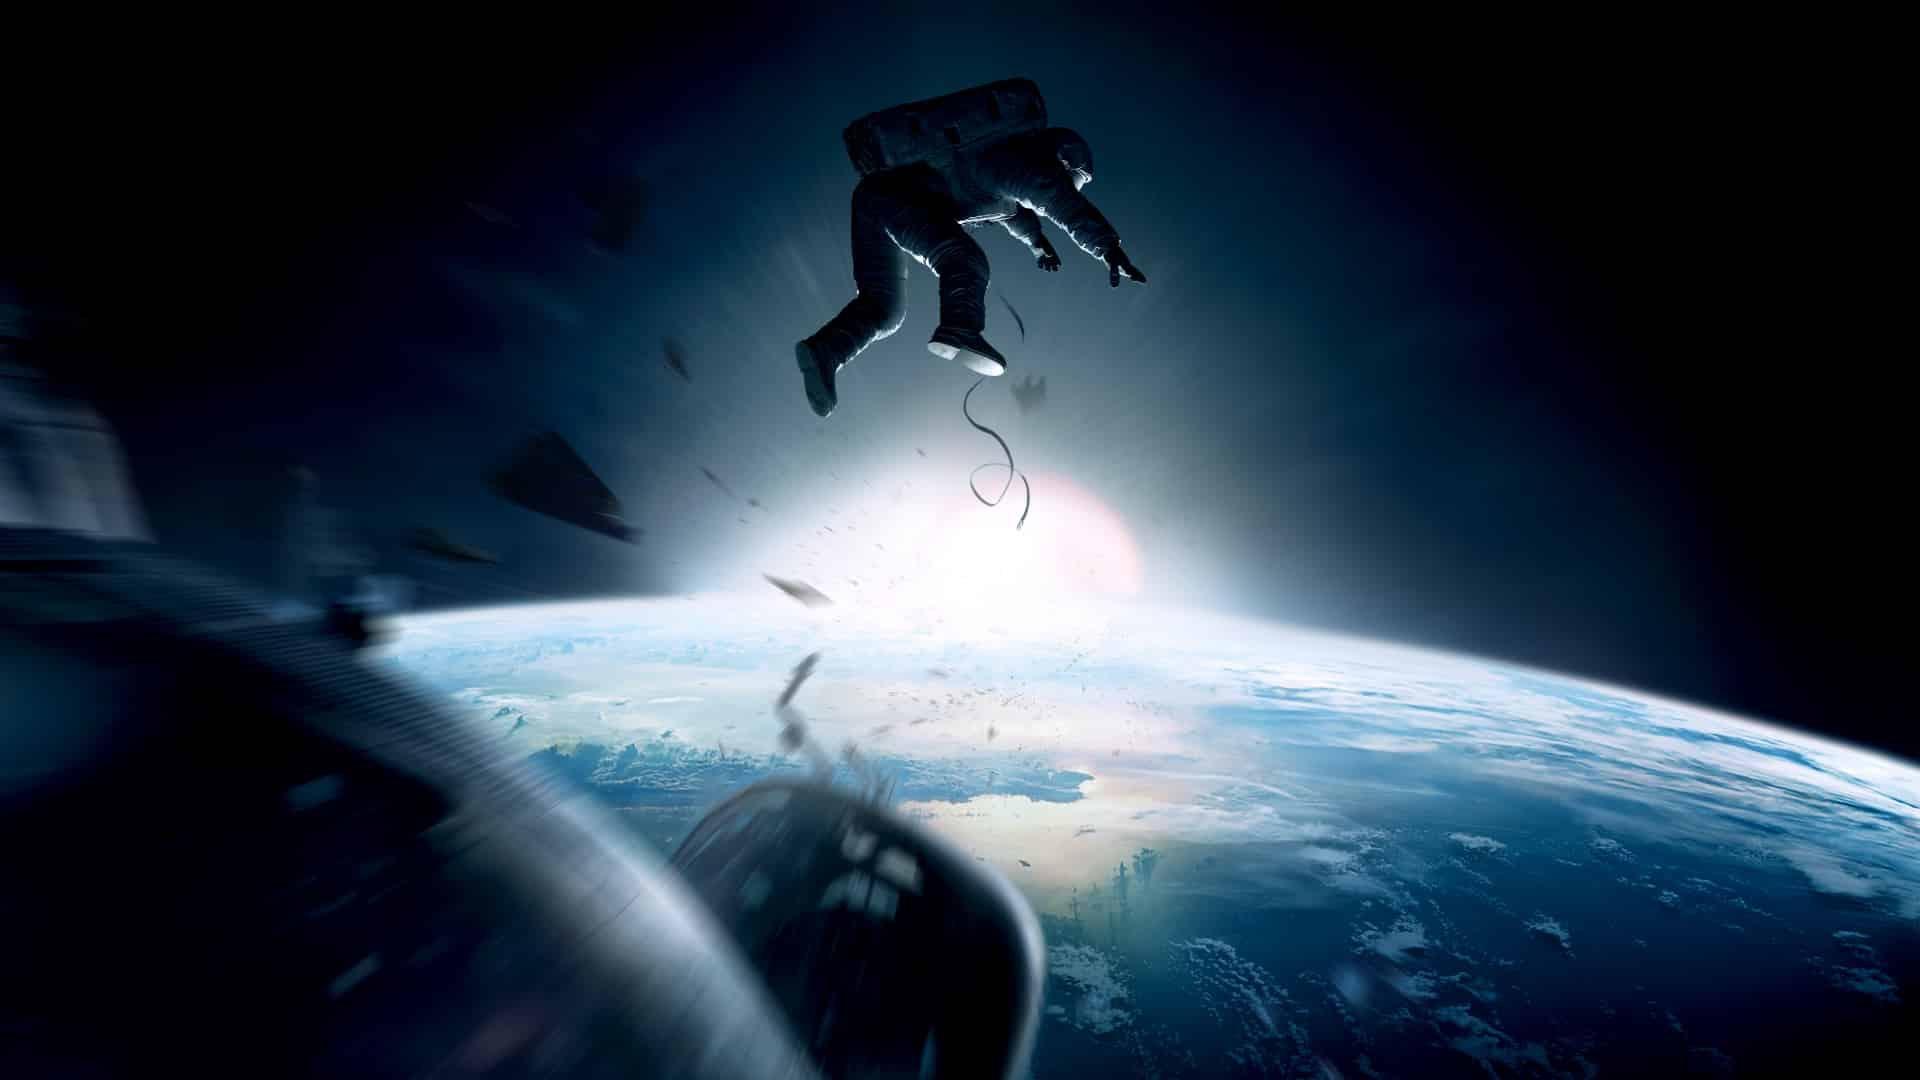 gravity2-1607111056.jpg